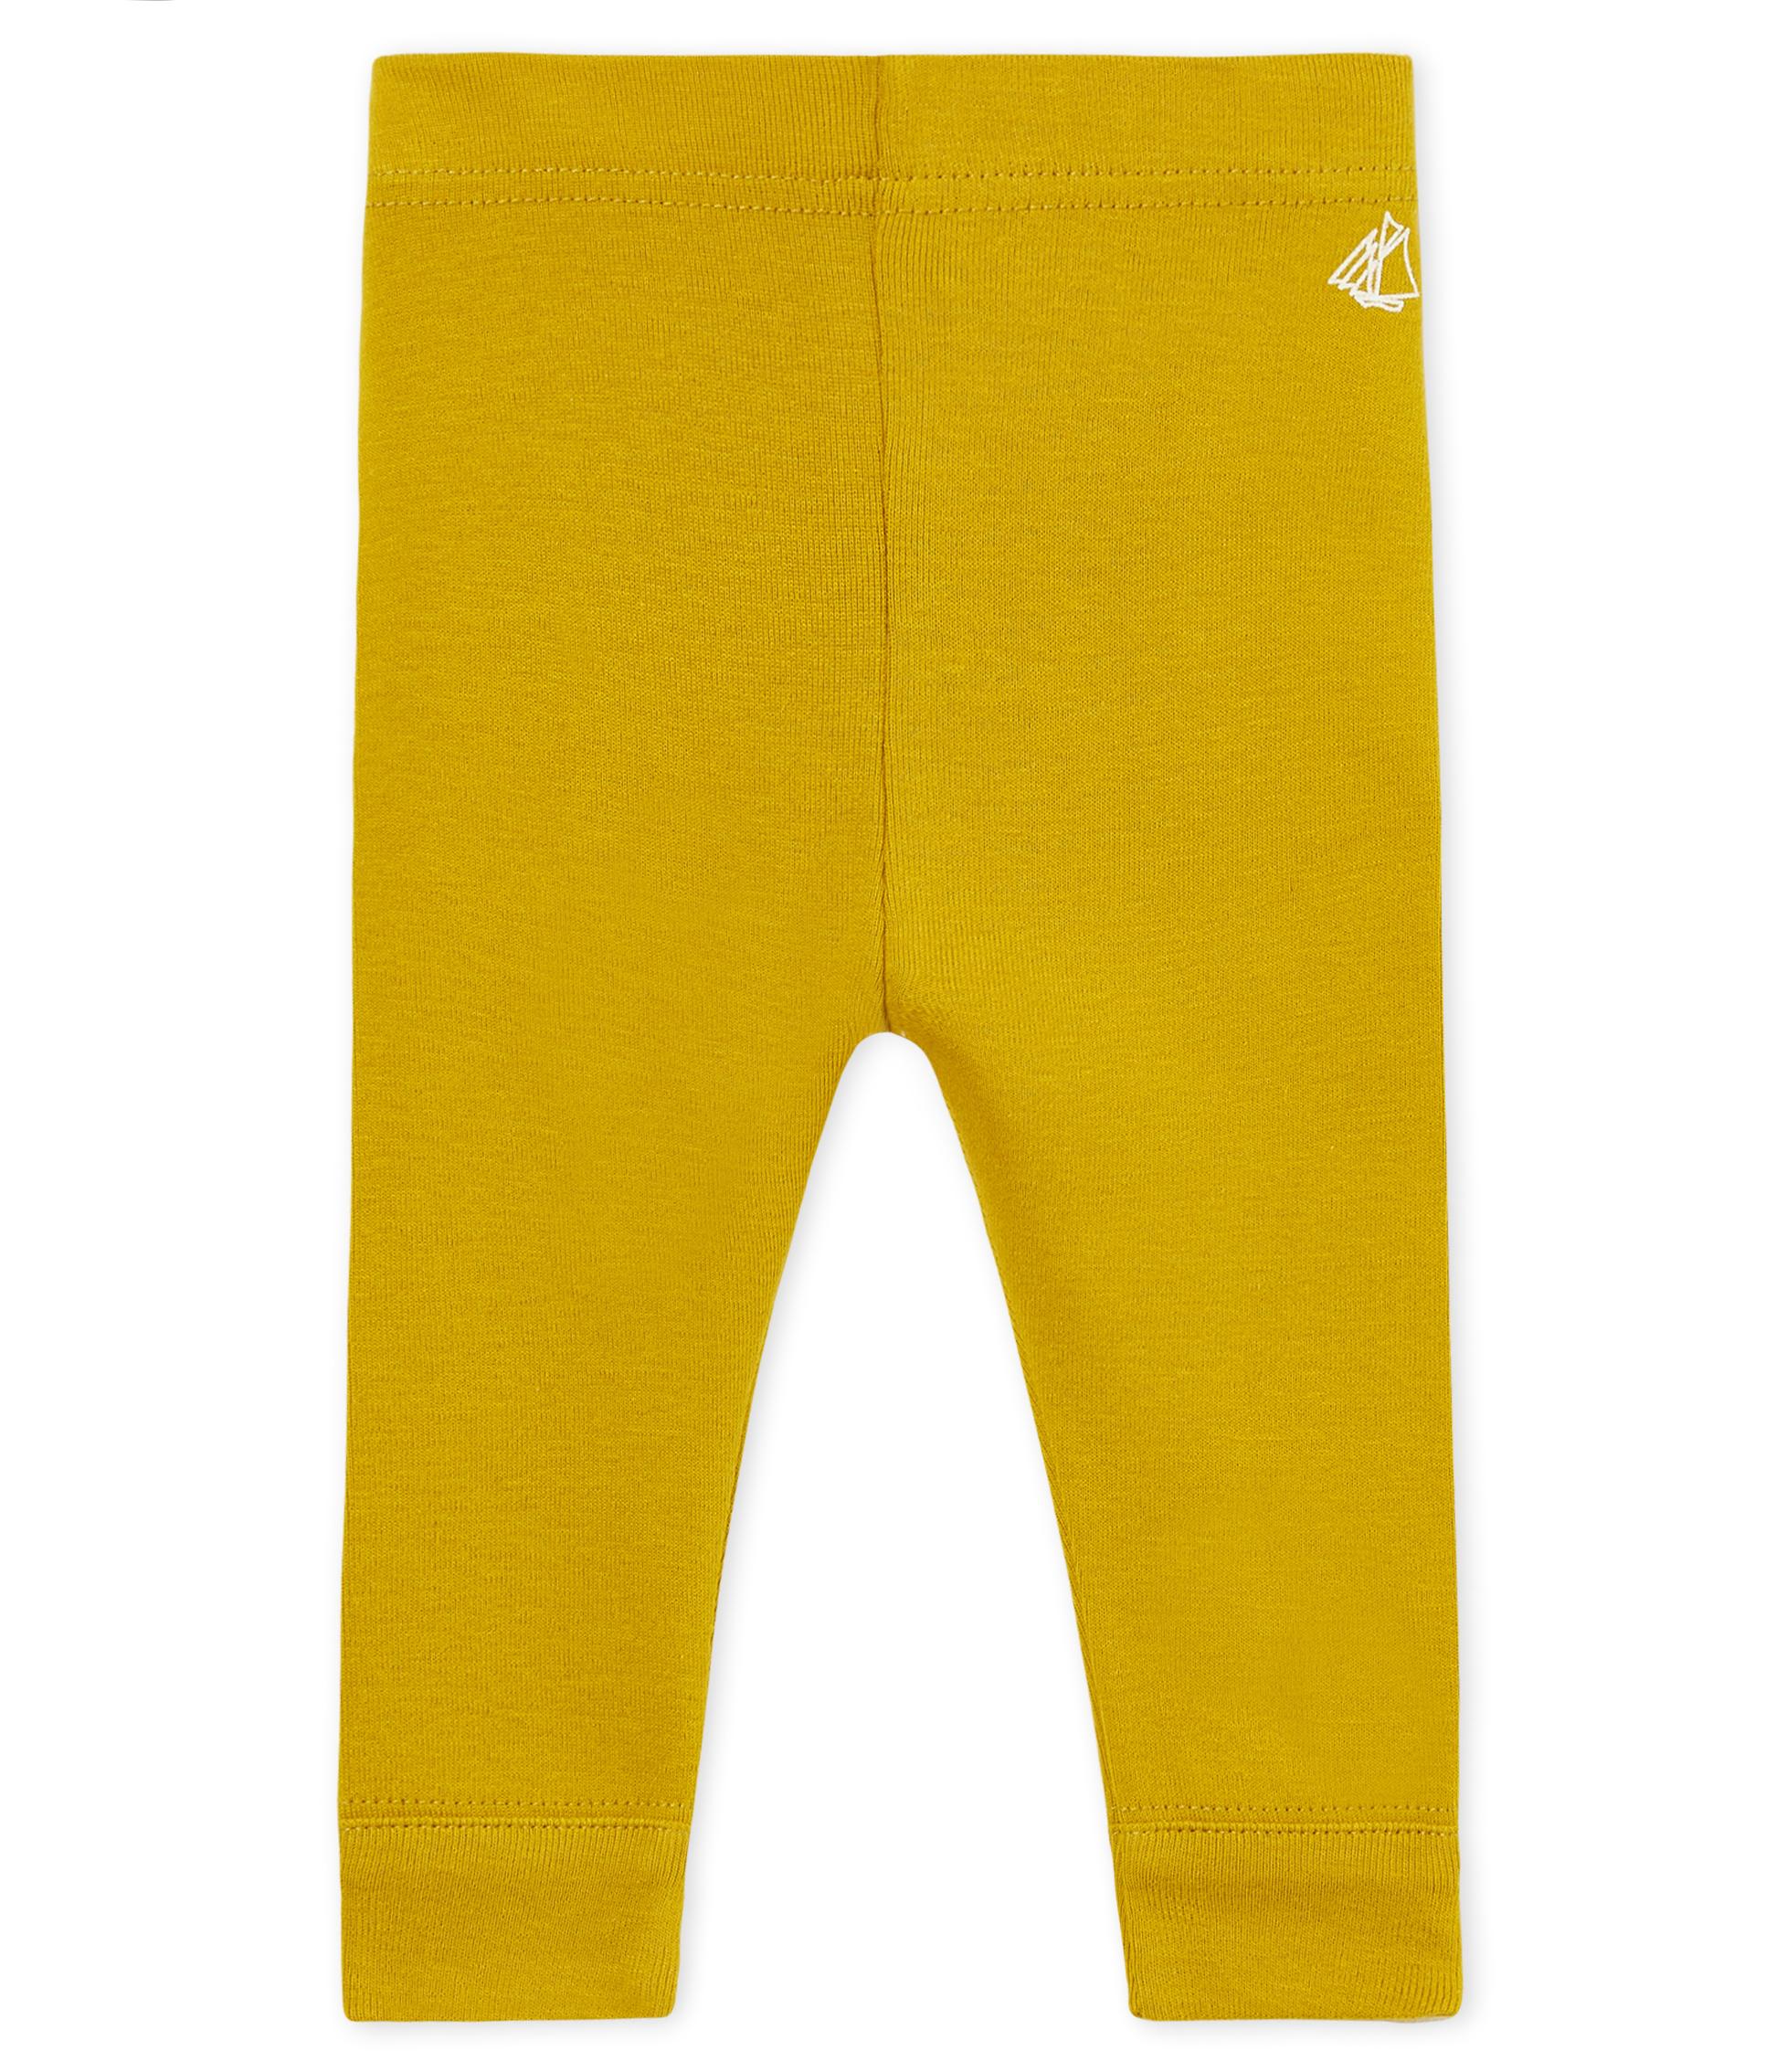 81add30e5cbe2c Baby girls' plain leggings | Petit Bateau